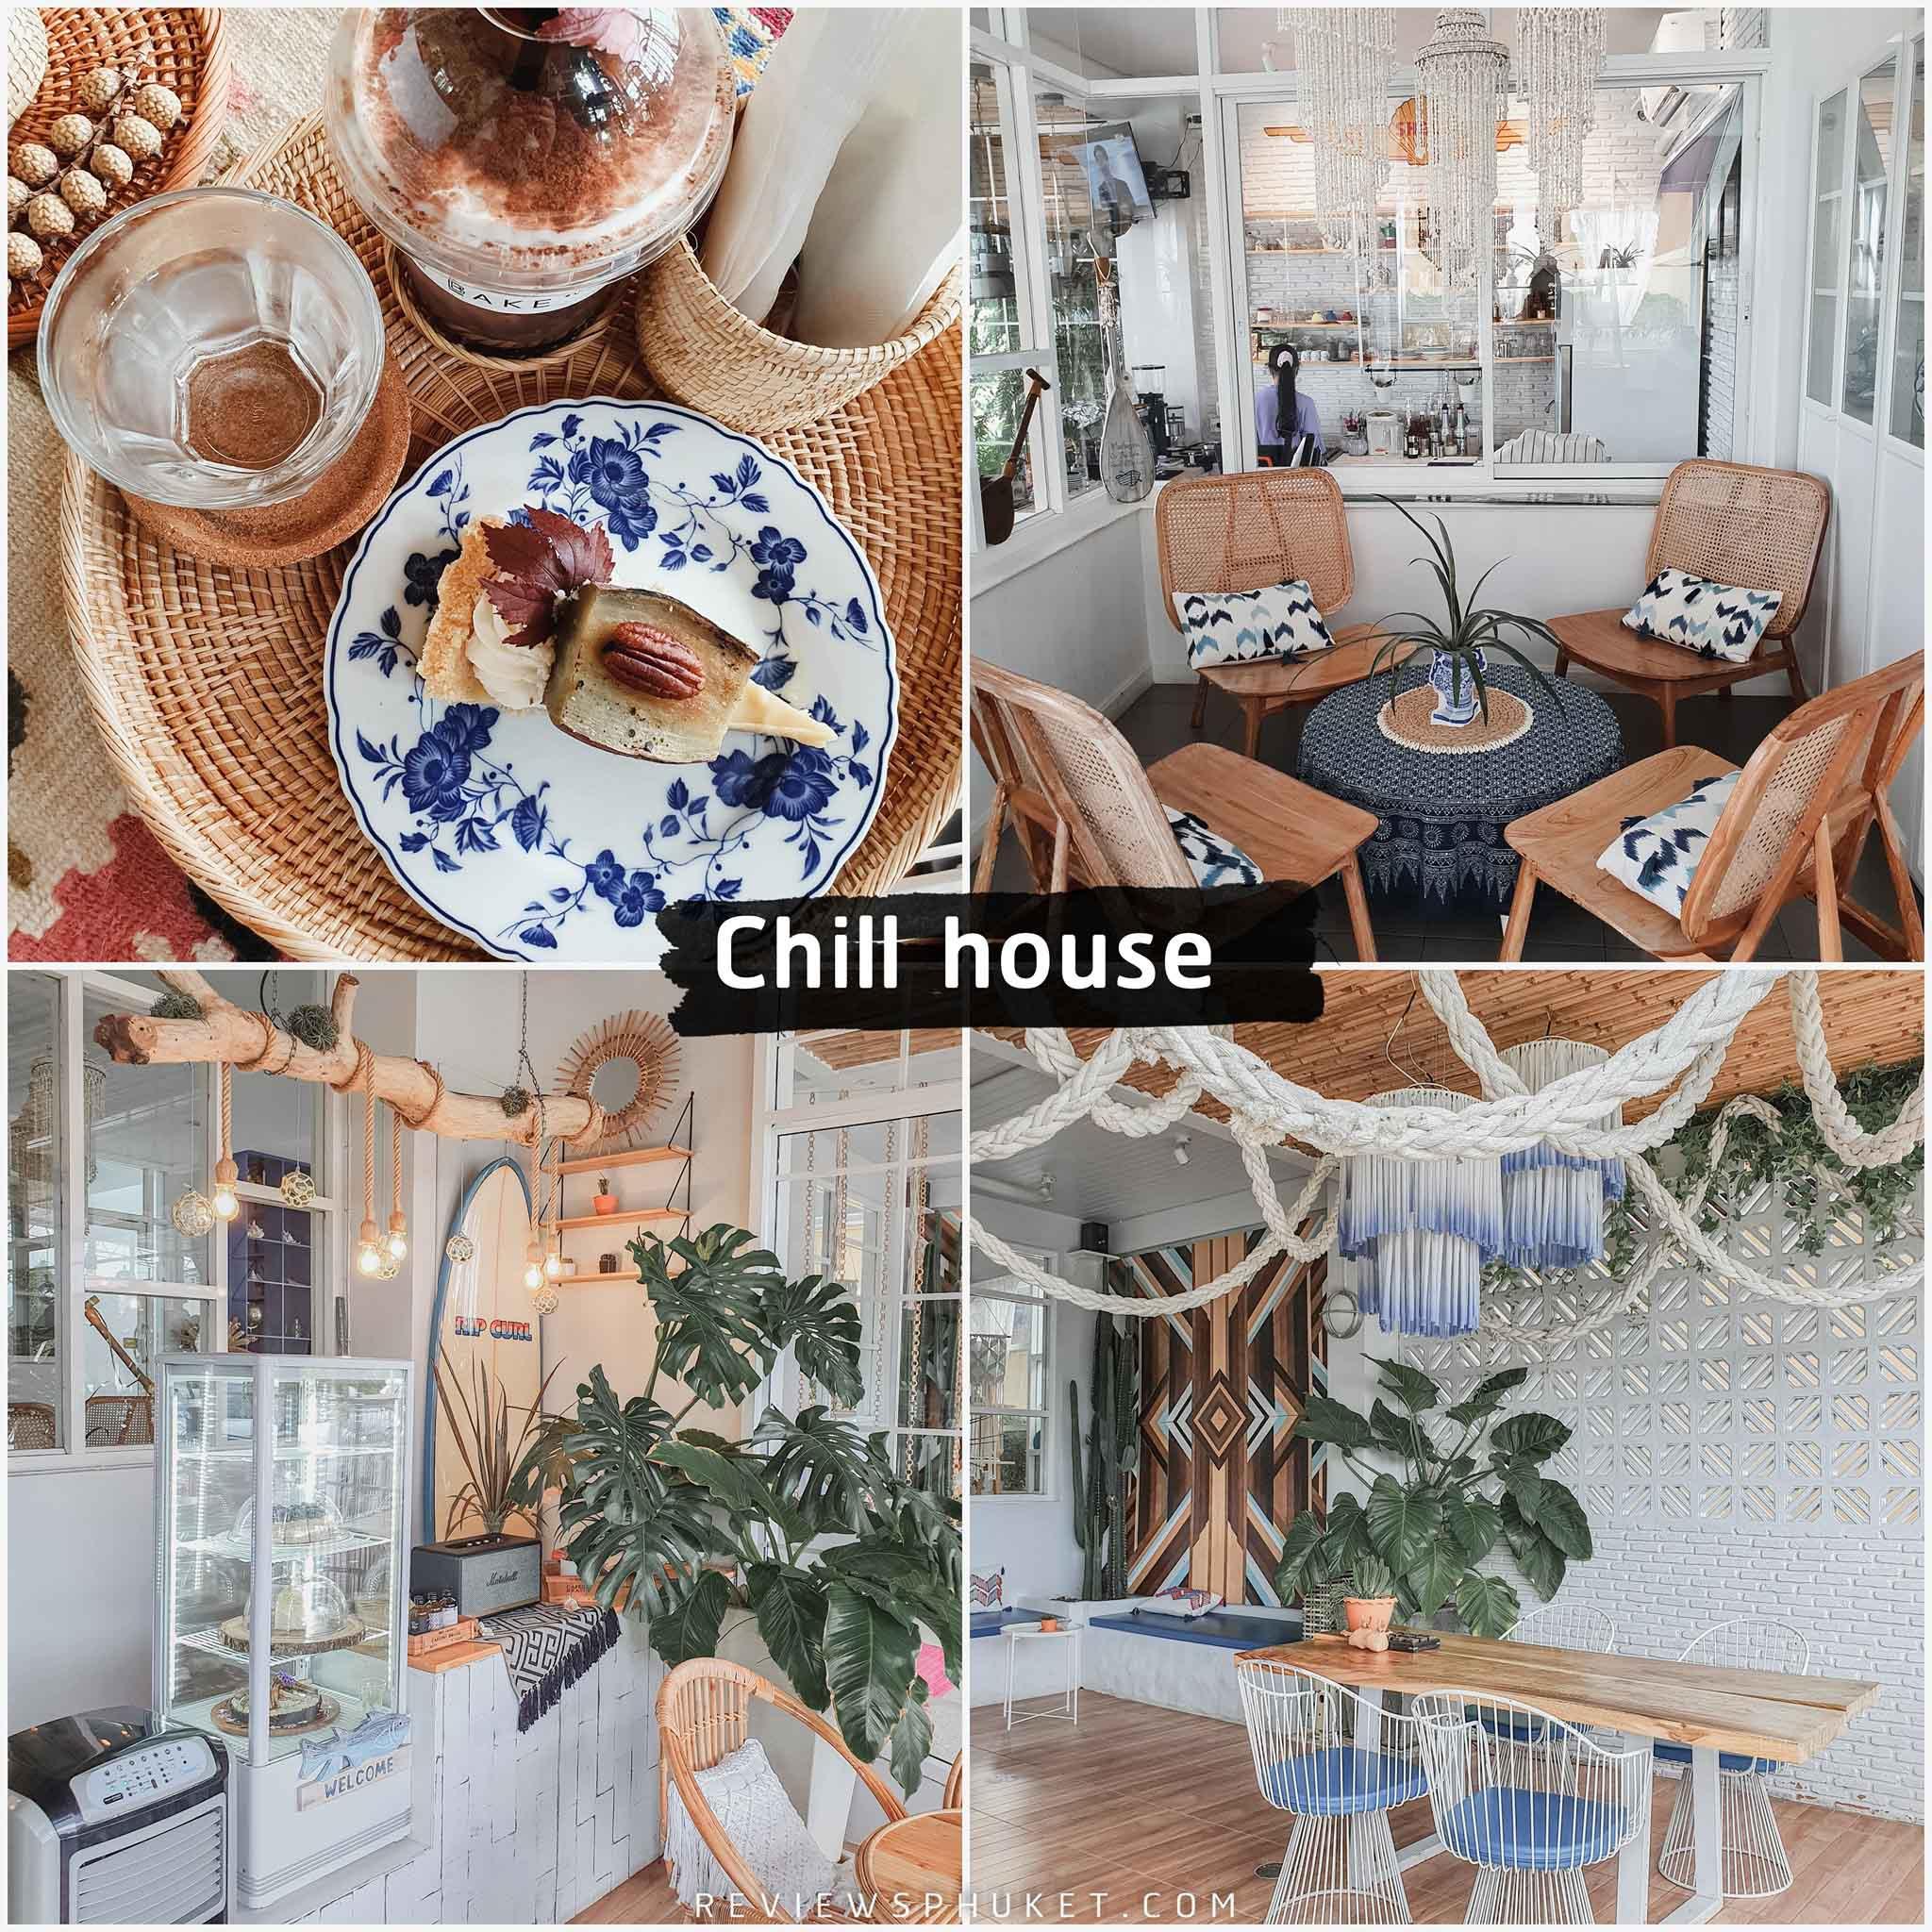 Chill-house-cafe จุดเช็คอินเด็ดๆภูเก็ต--ร้านตกแต่งด้วยต้นไม้สบายตา-อากาศเย็นเหมาะกับการไปนั่งชิลคุยกันเพื่อนๆแนะนำเลยย  ภูเก็ต,คาเฟ่,ที่เที่ยว,ร้านกาแฟ,เด็ด,อร่อย,ต้องลอง